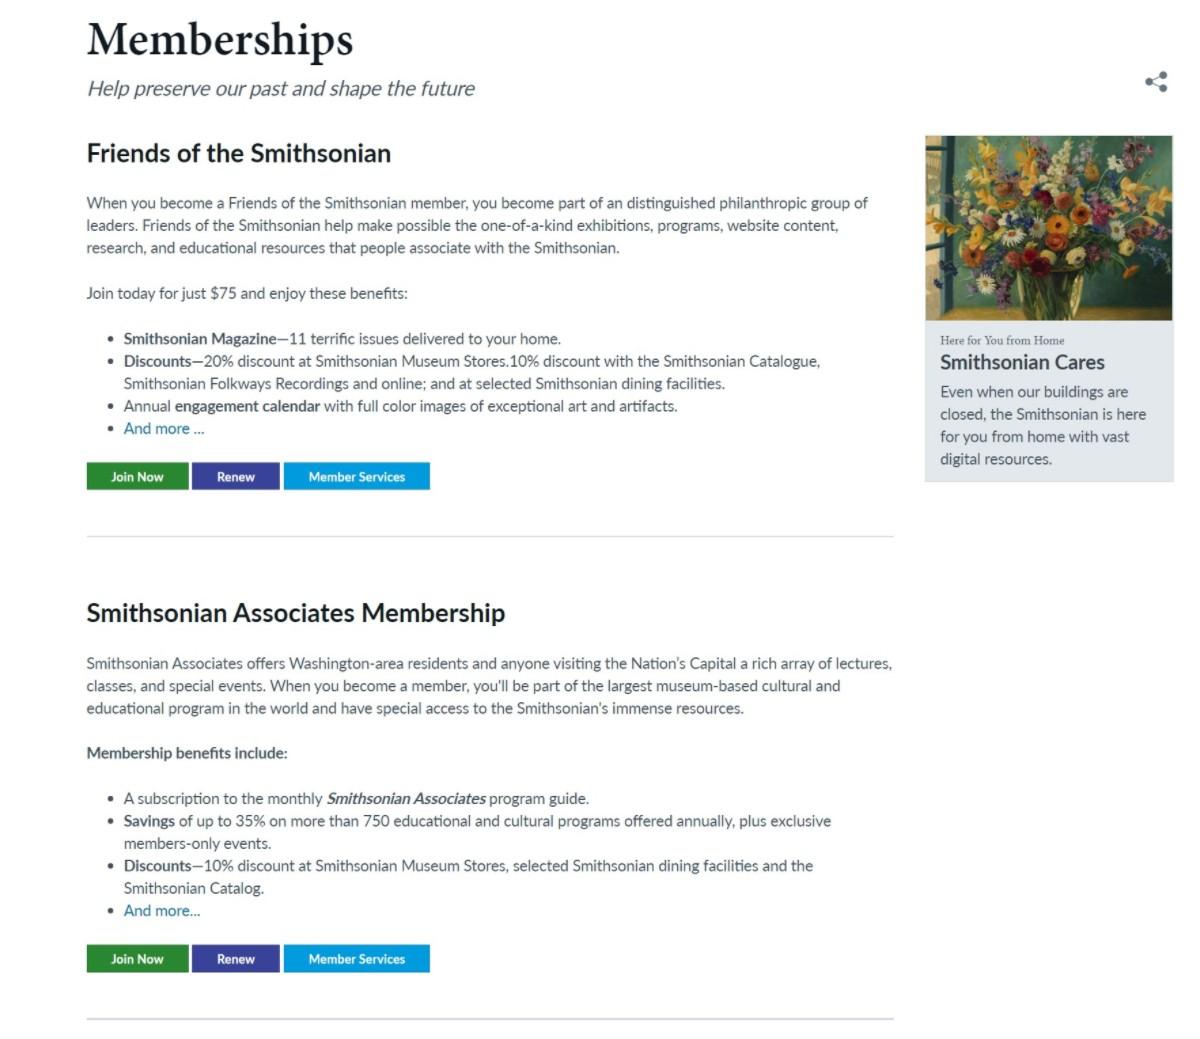 Smithsonian membership levels